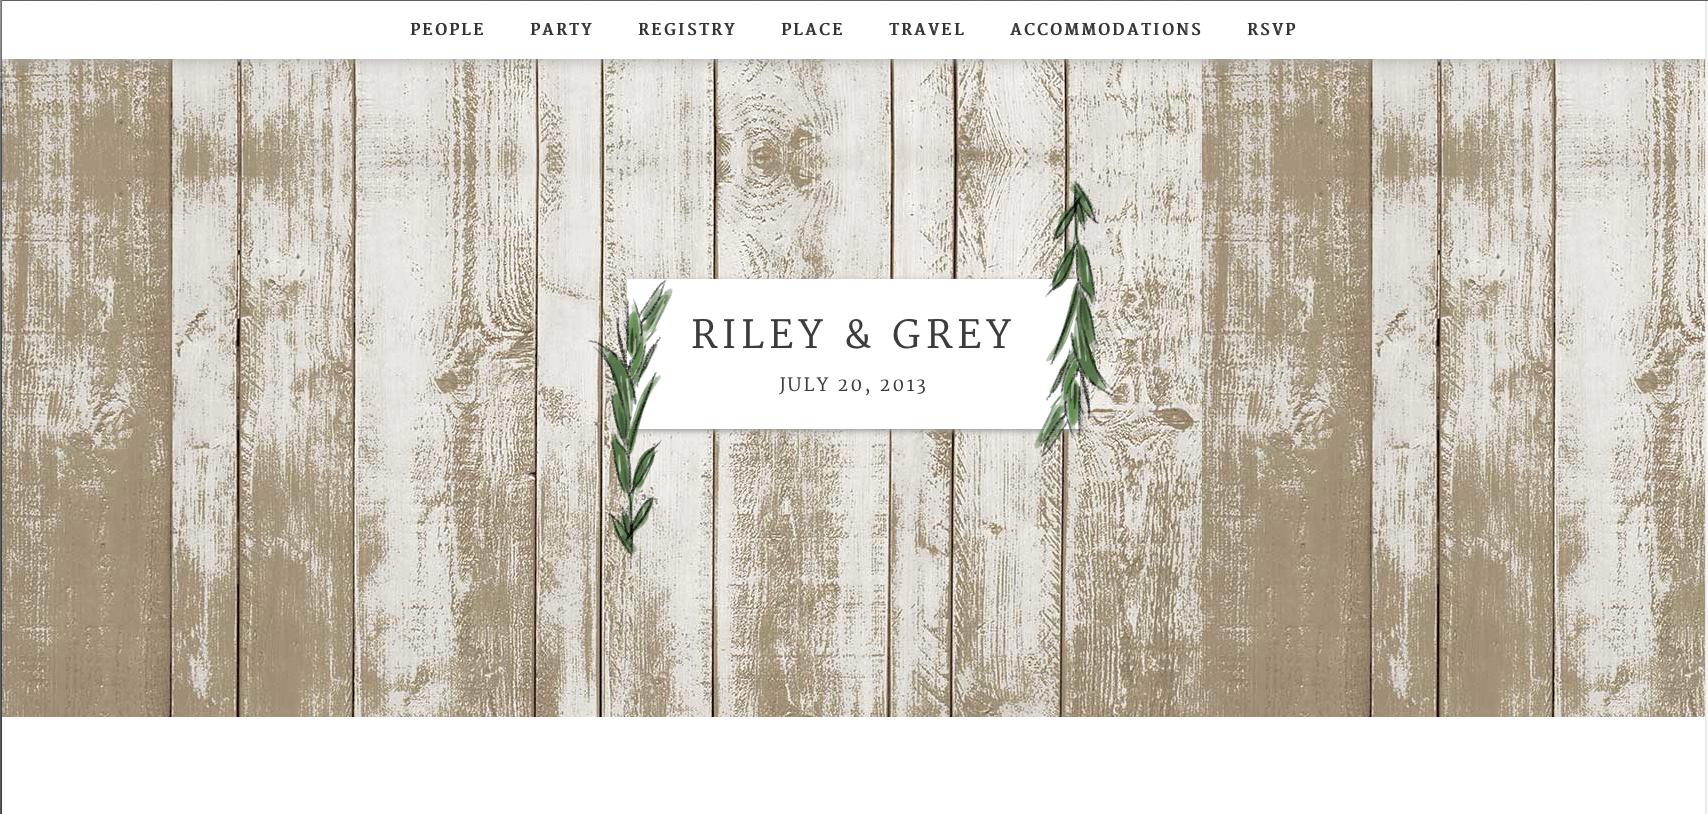 Wedding website CT wedding planner riley & grey